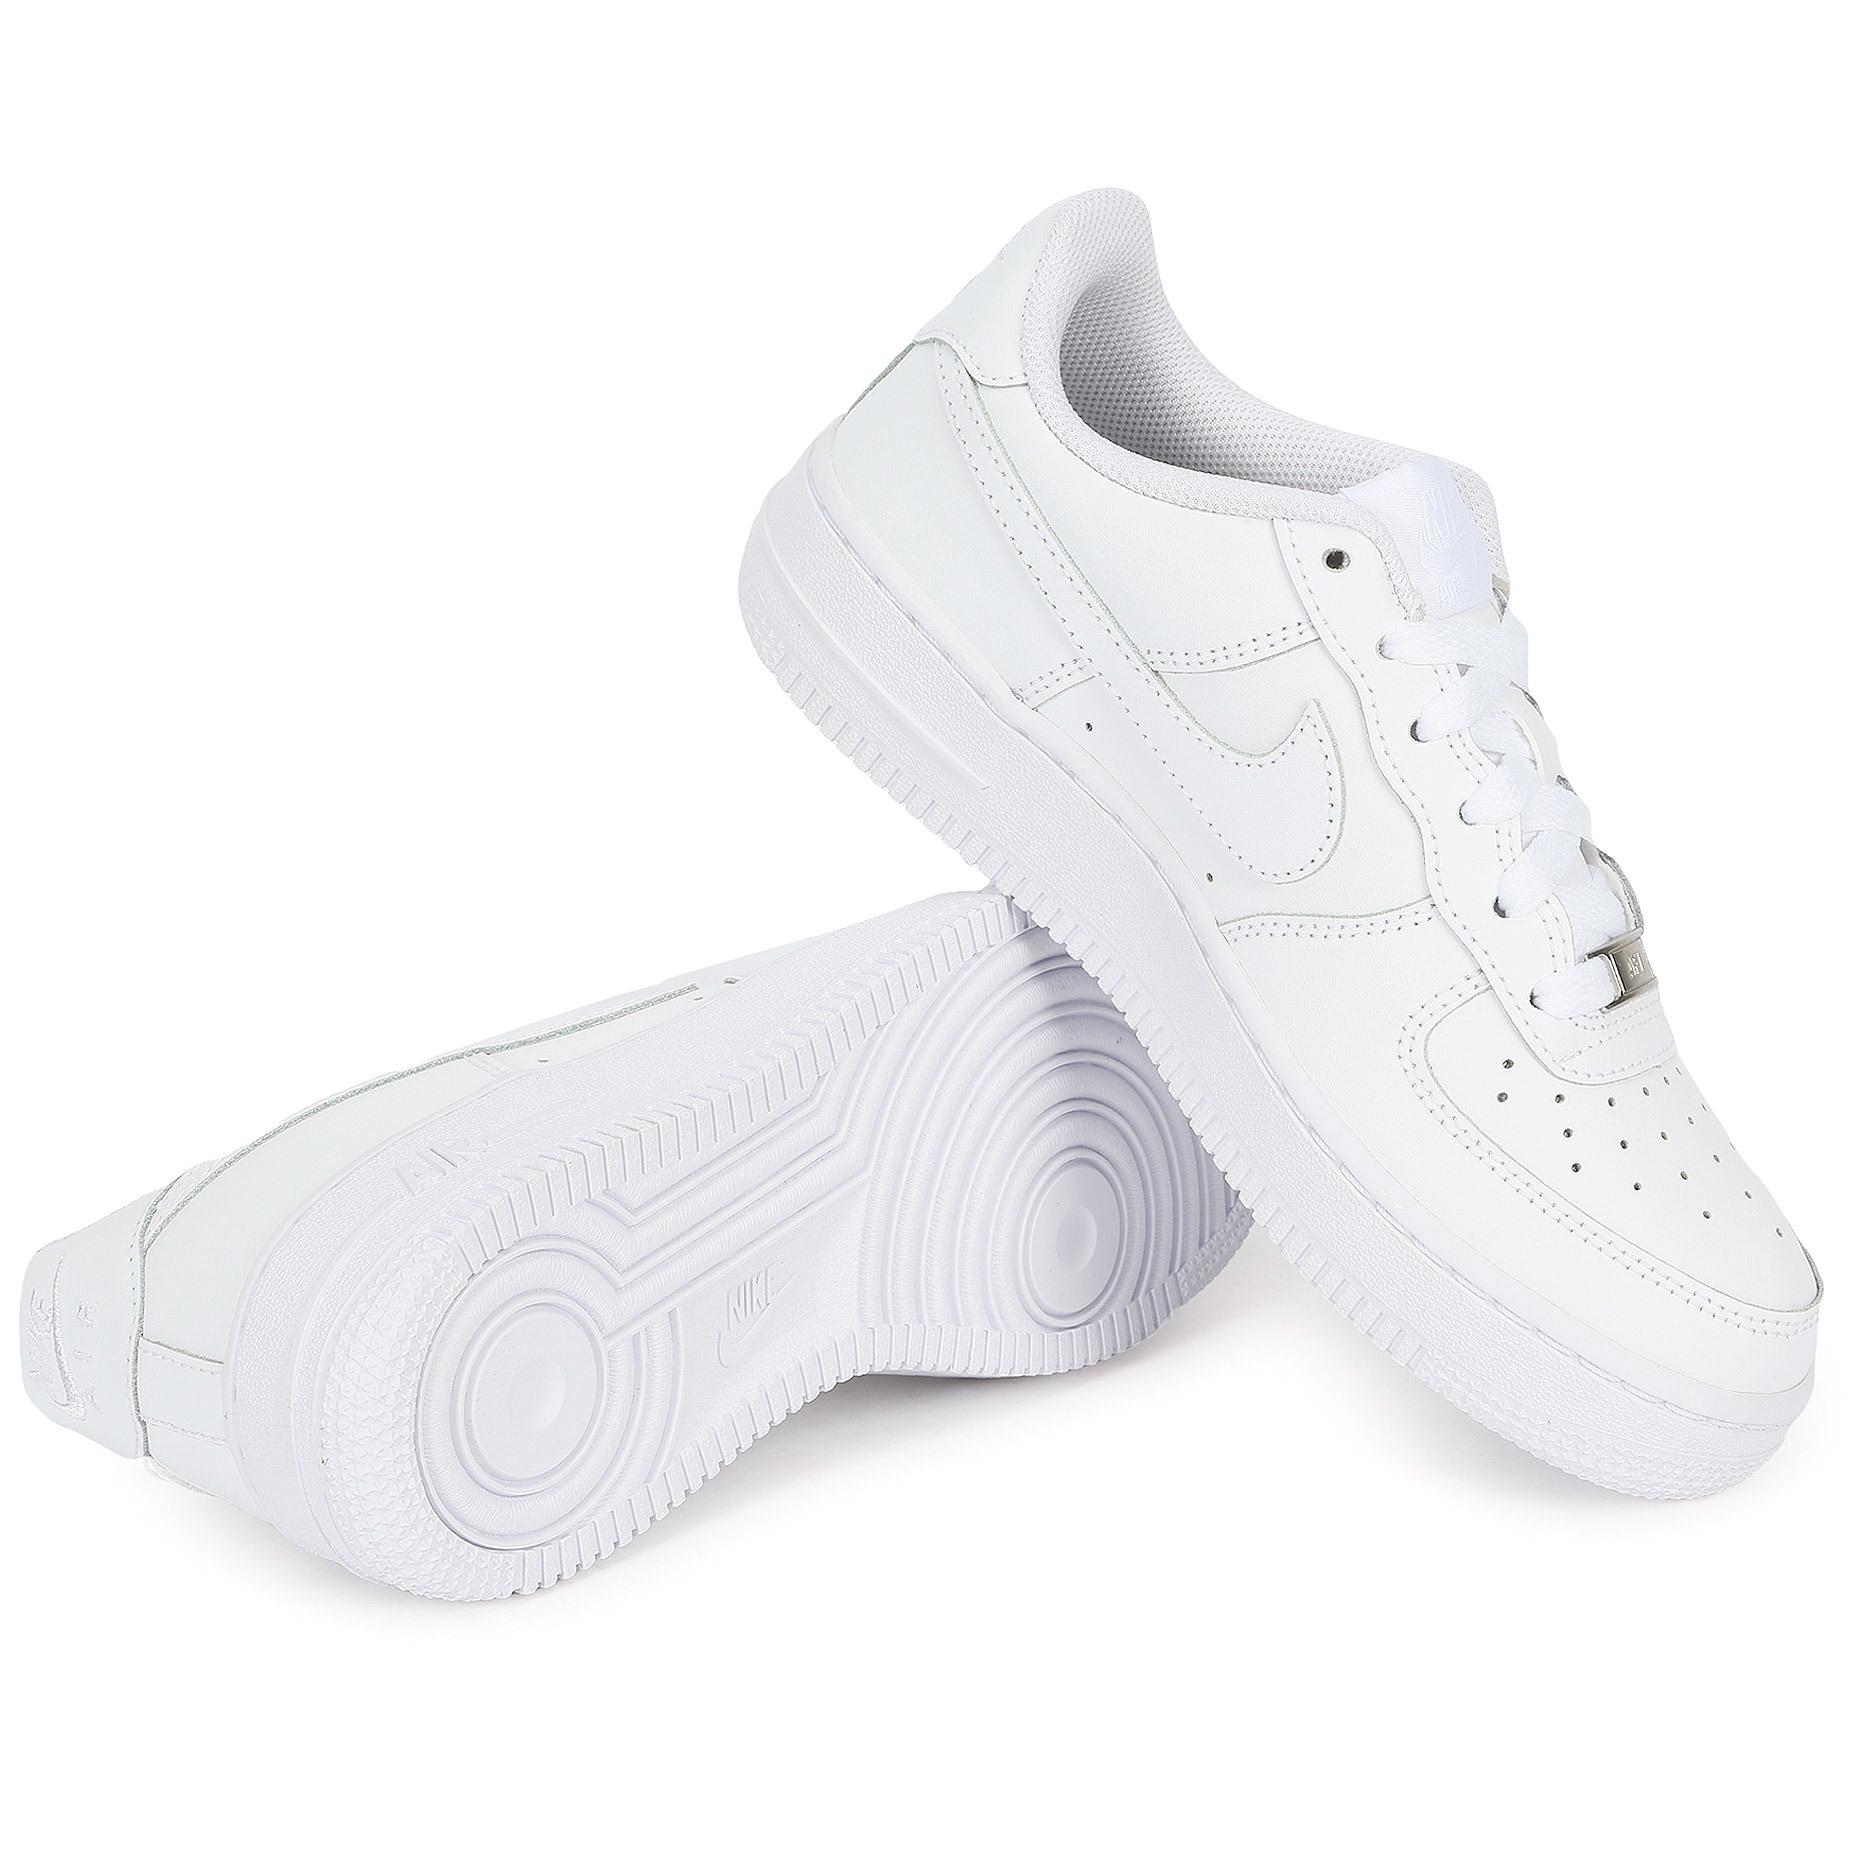 Nike Air Force 1 07 White ЗИМА